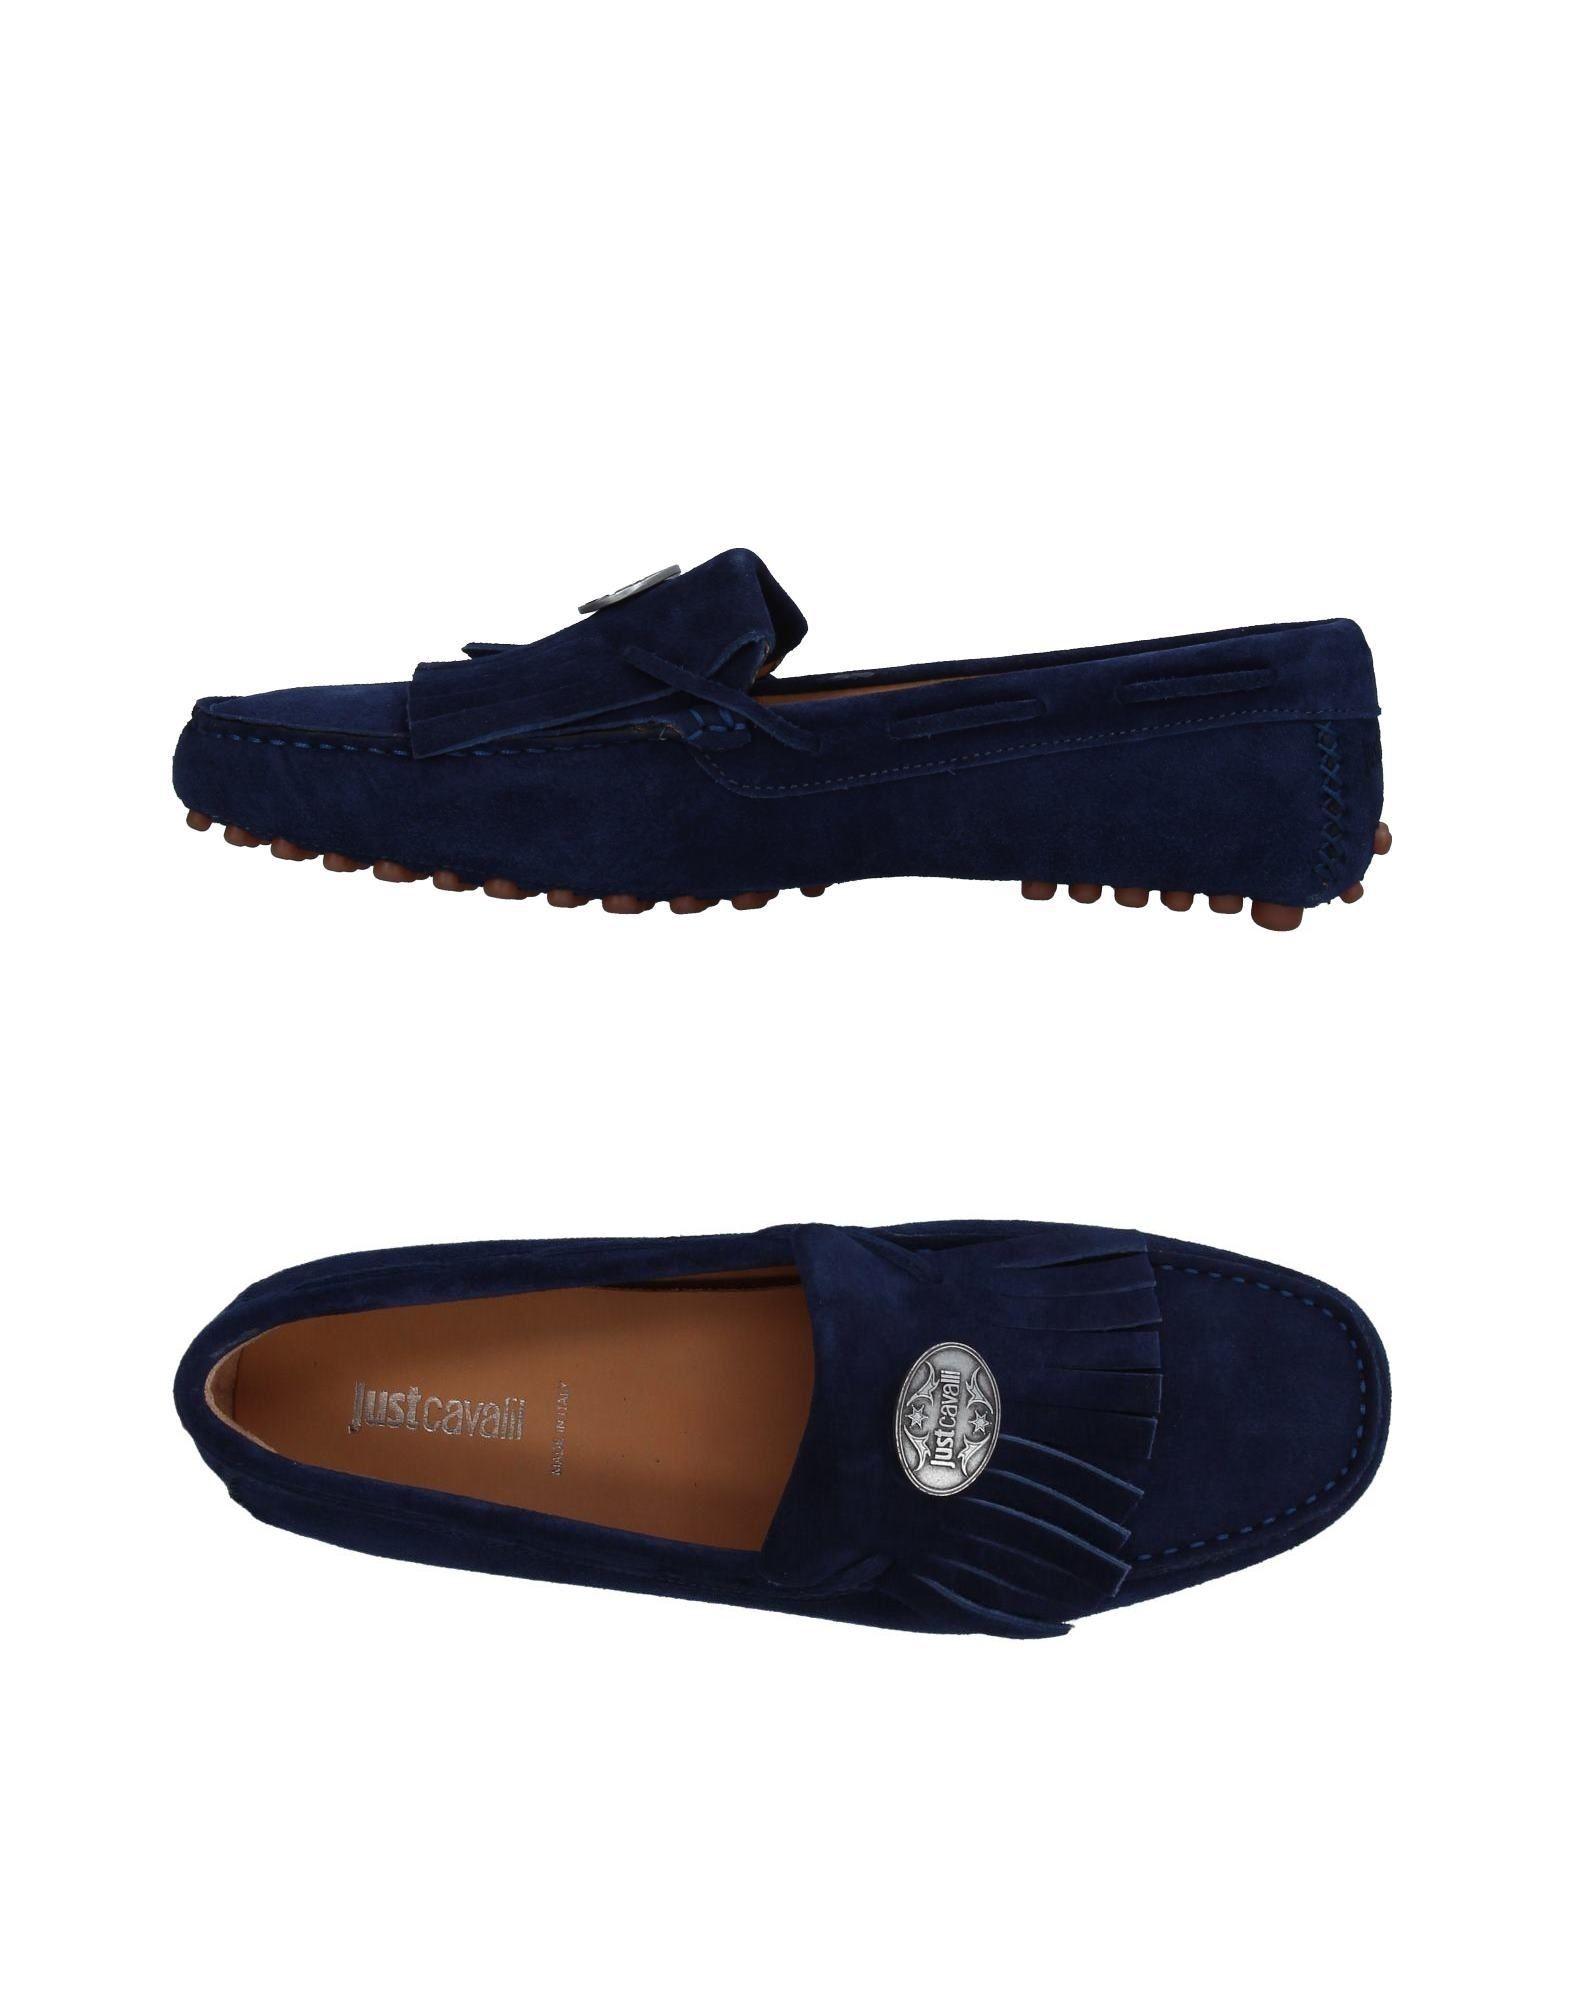 Just Cavalli Mokassins Herren  11354062JG Gute Qualität beliebte Schuhe